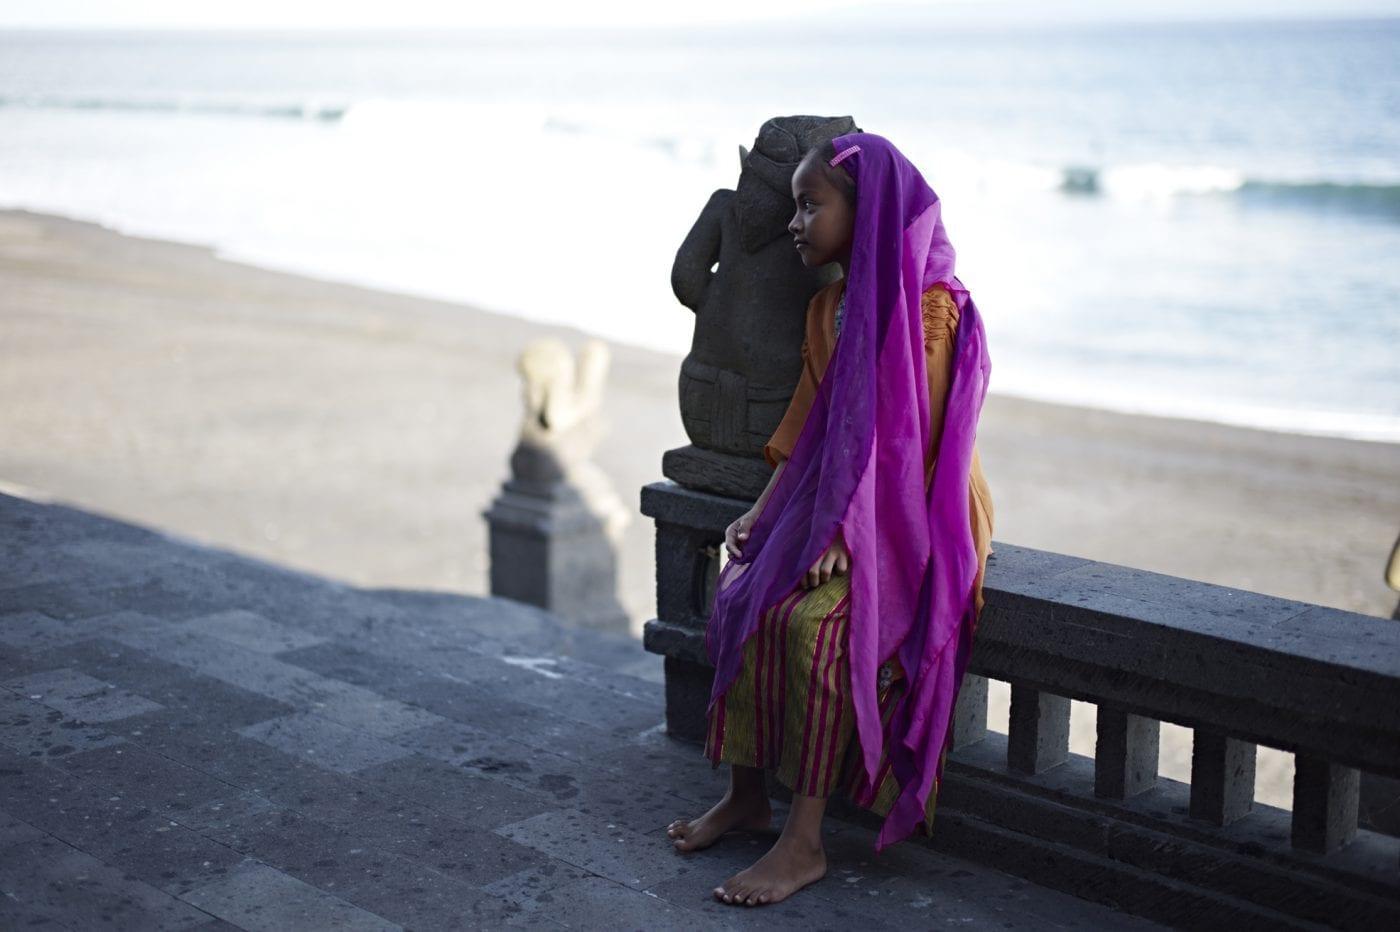 2013 in Bali – Maedchen am Strand